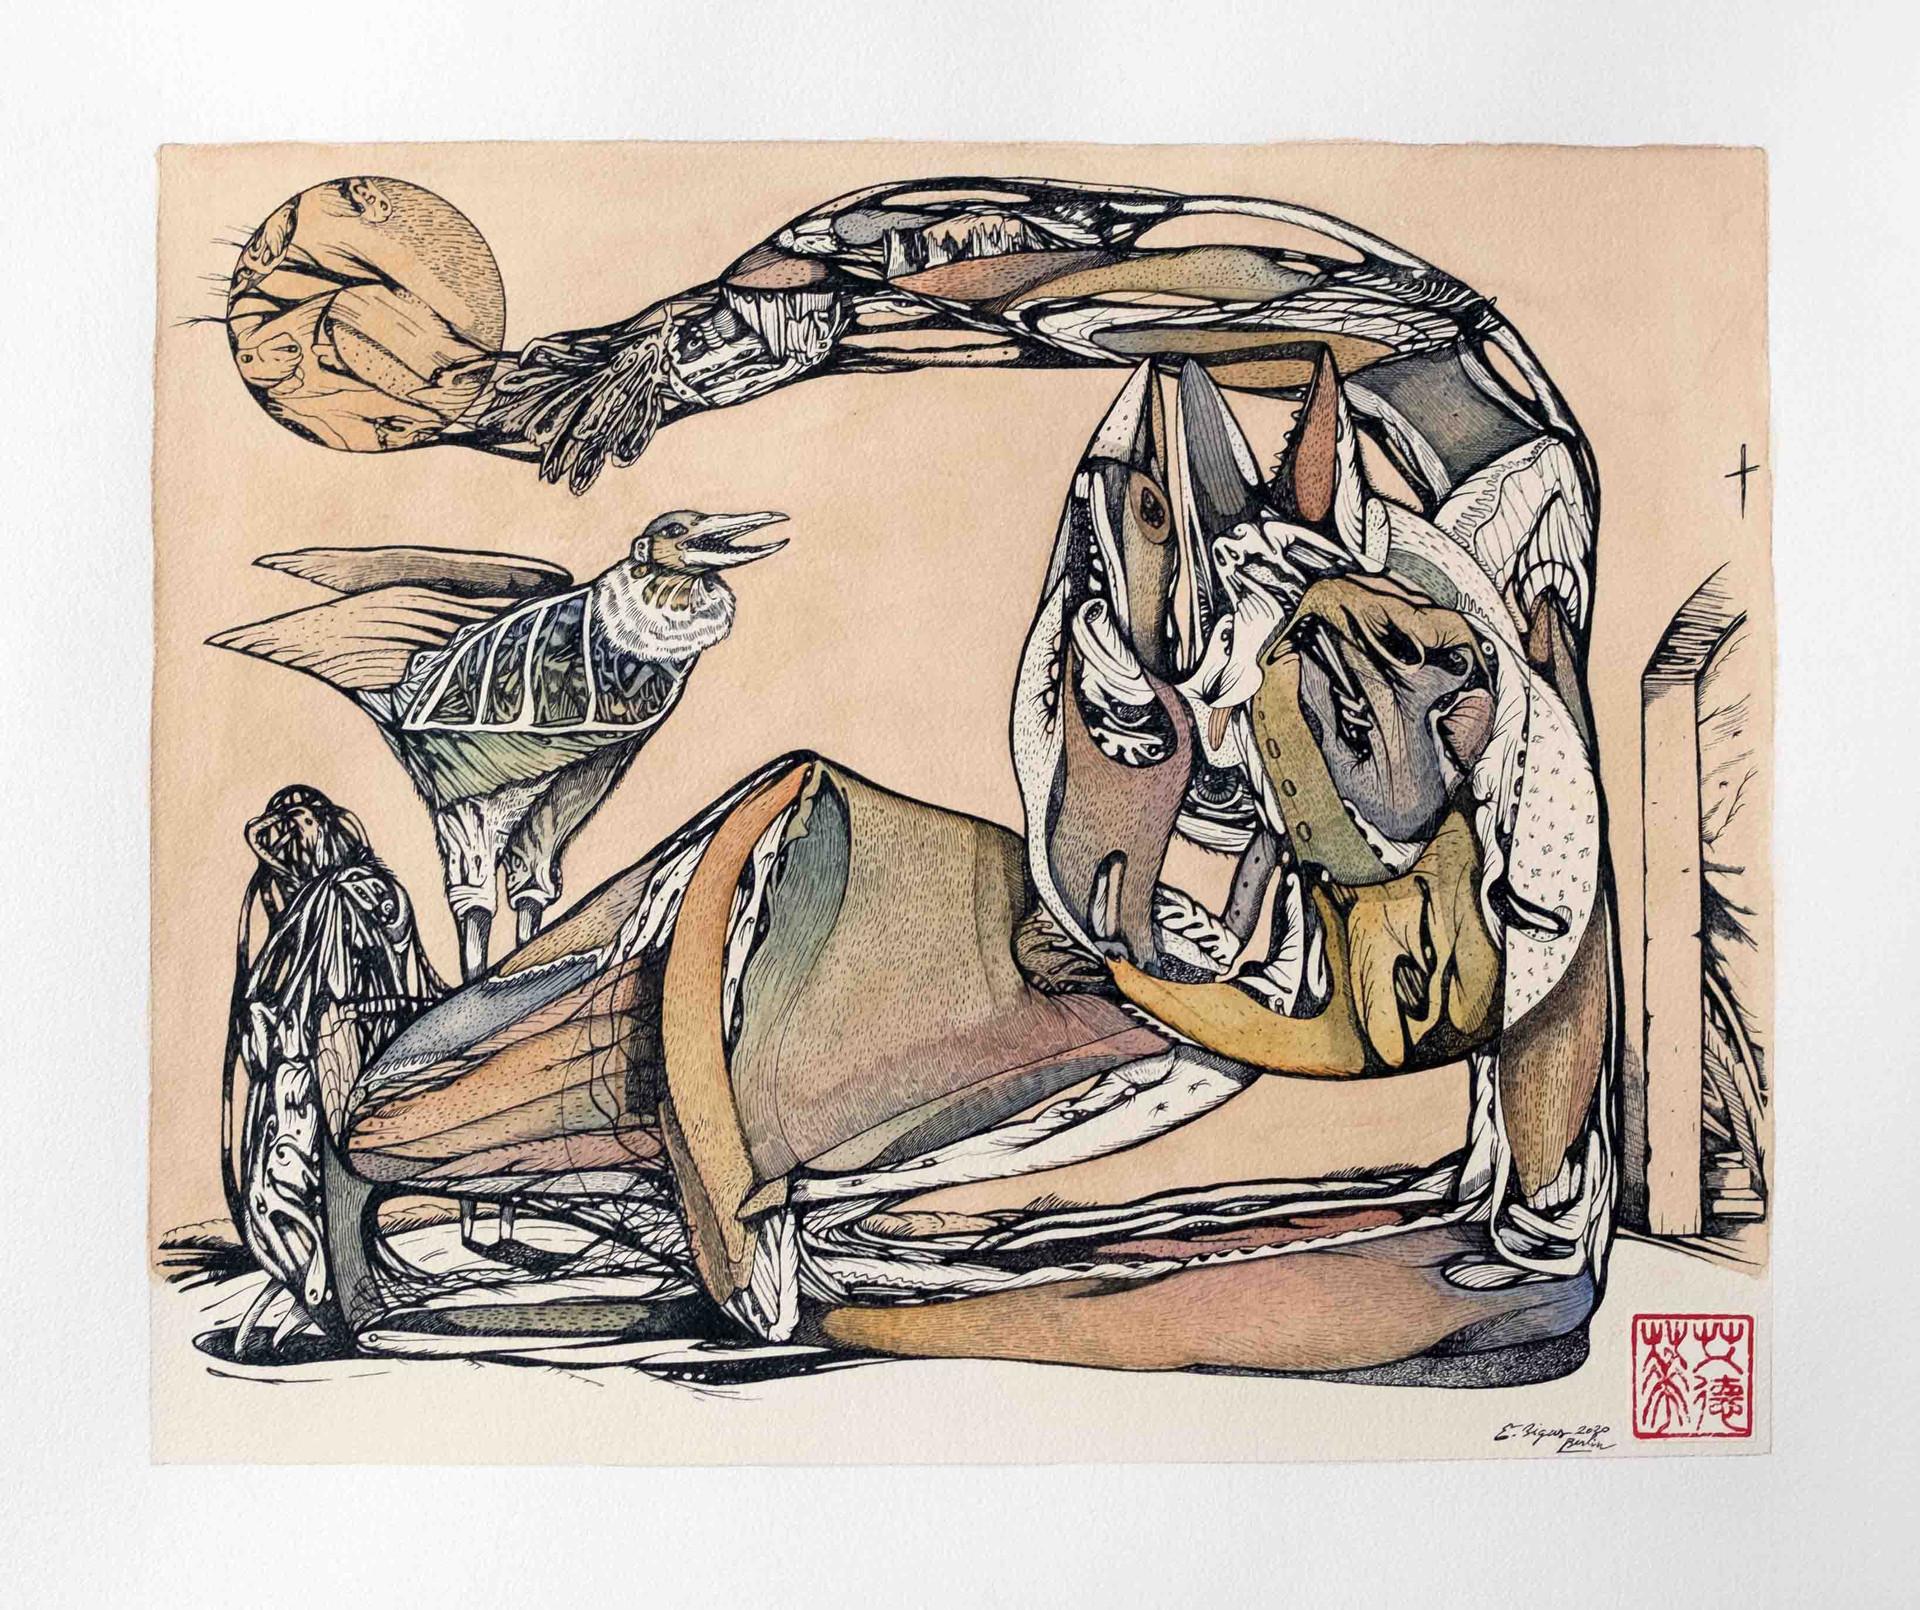 La mort vestida 2020 45.5cmx53cm Ink, watercolour and tea on paper